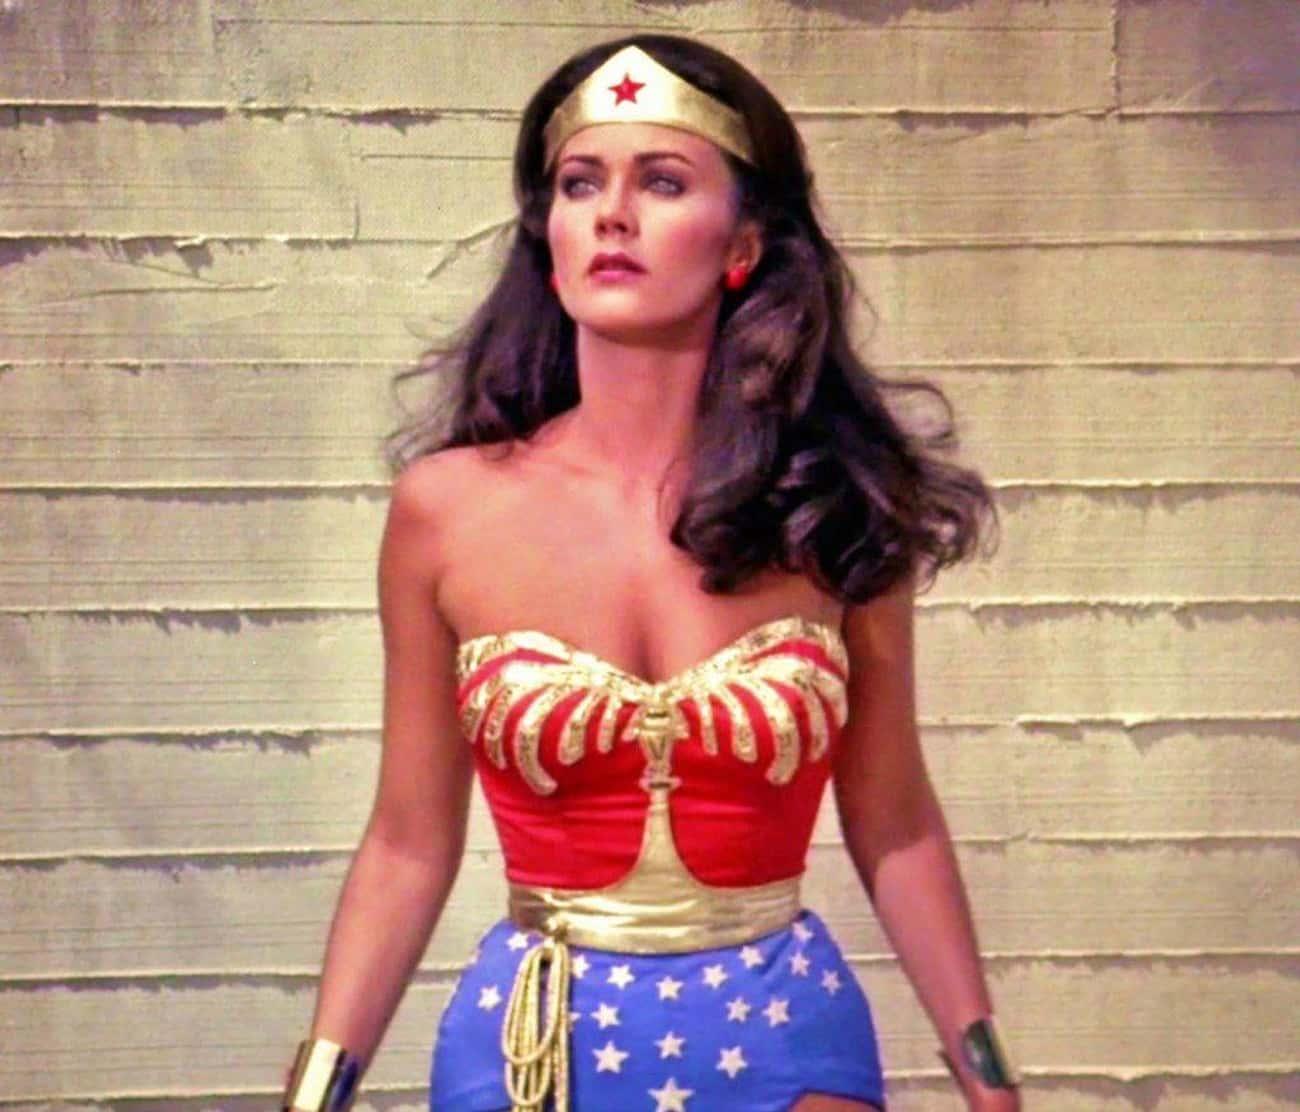 Wonder Woman In 'Wonder Woman'